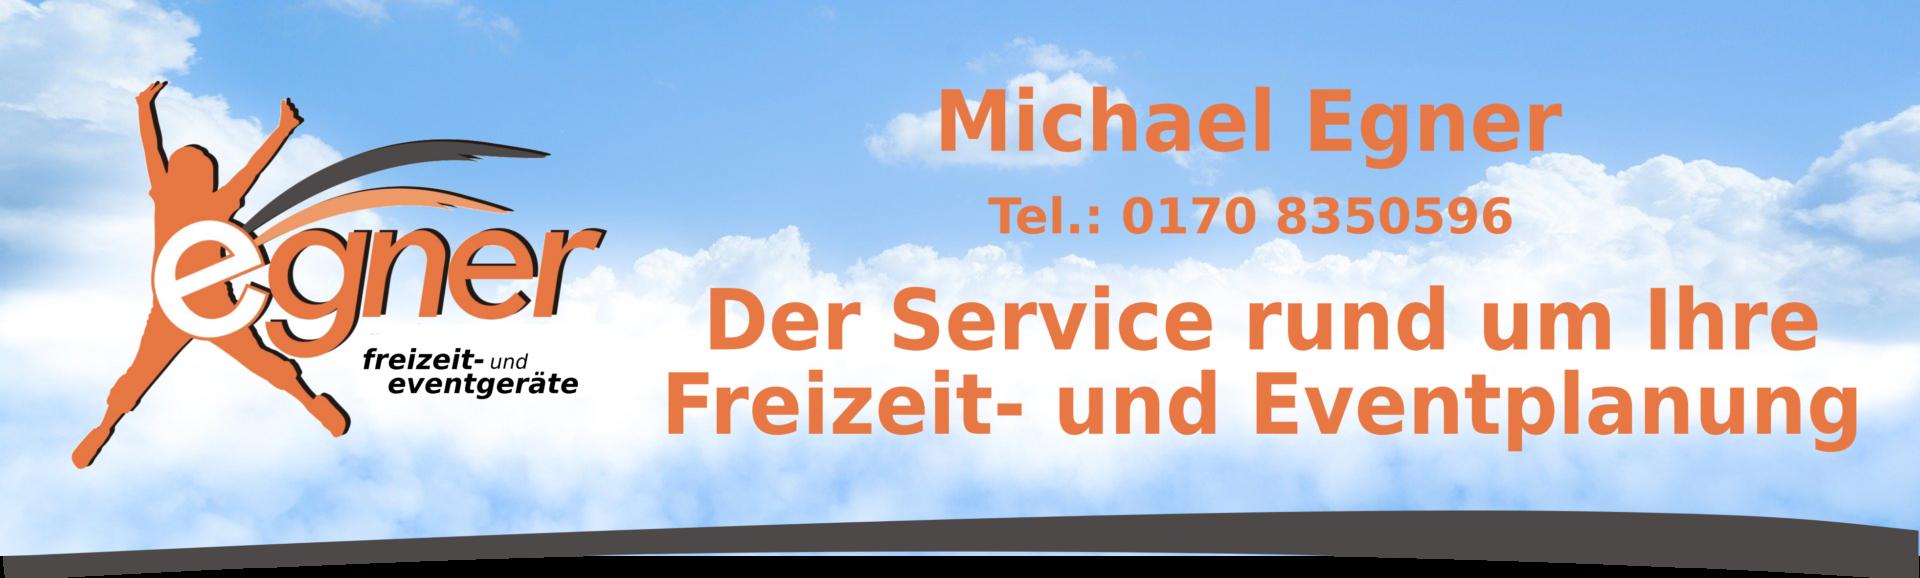 Michael Egner